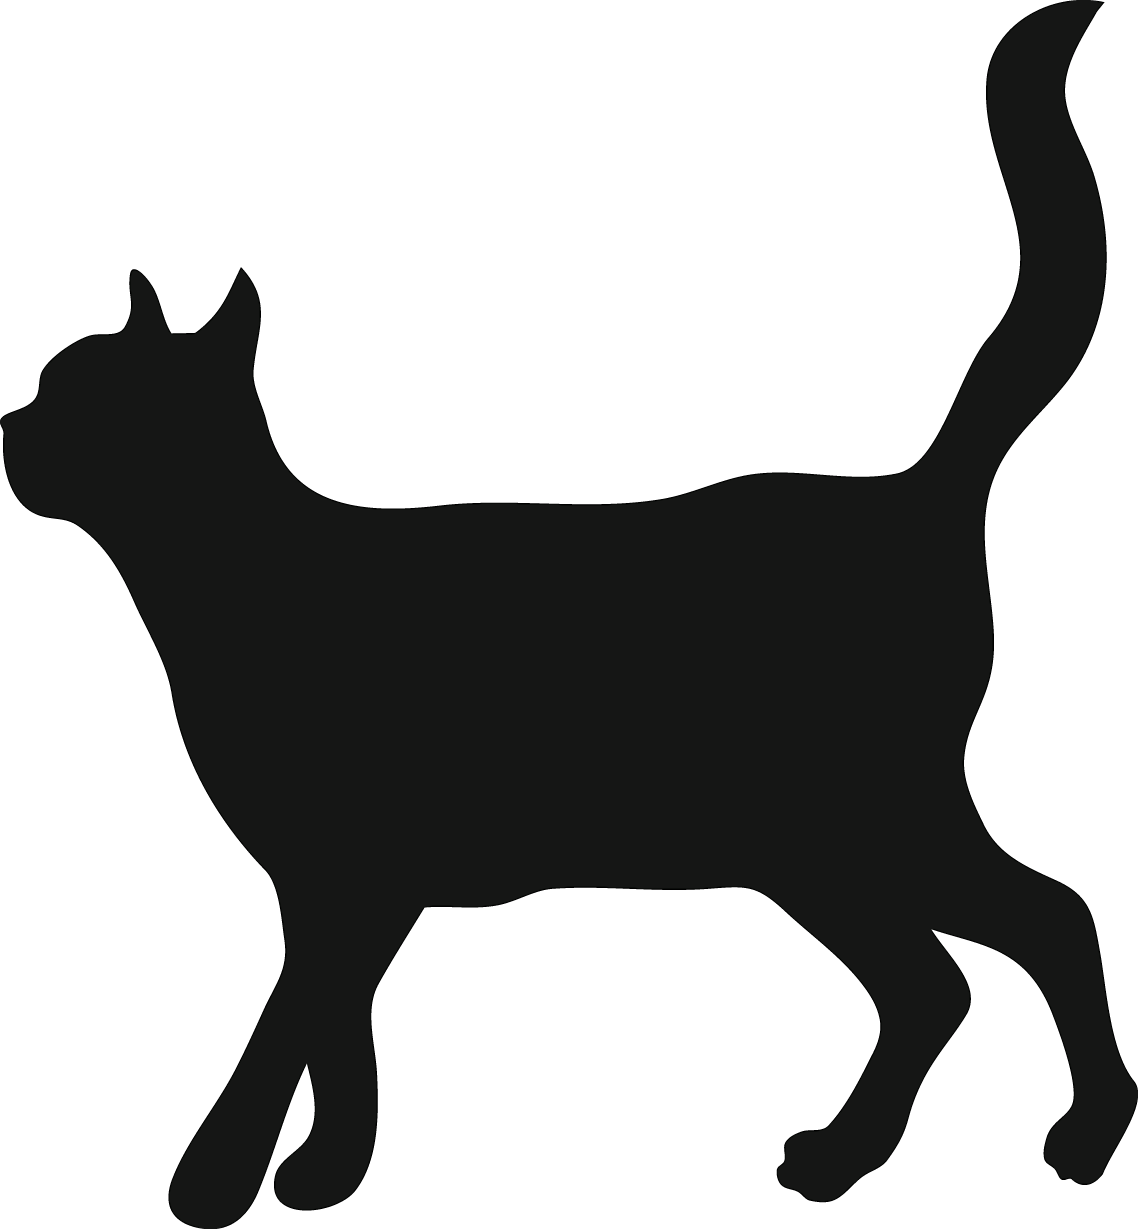 Black Cat Openinf